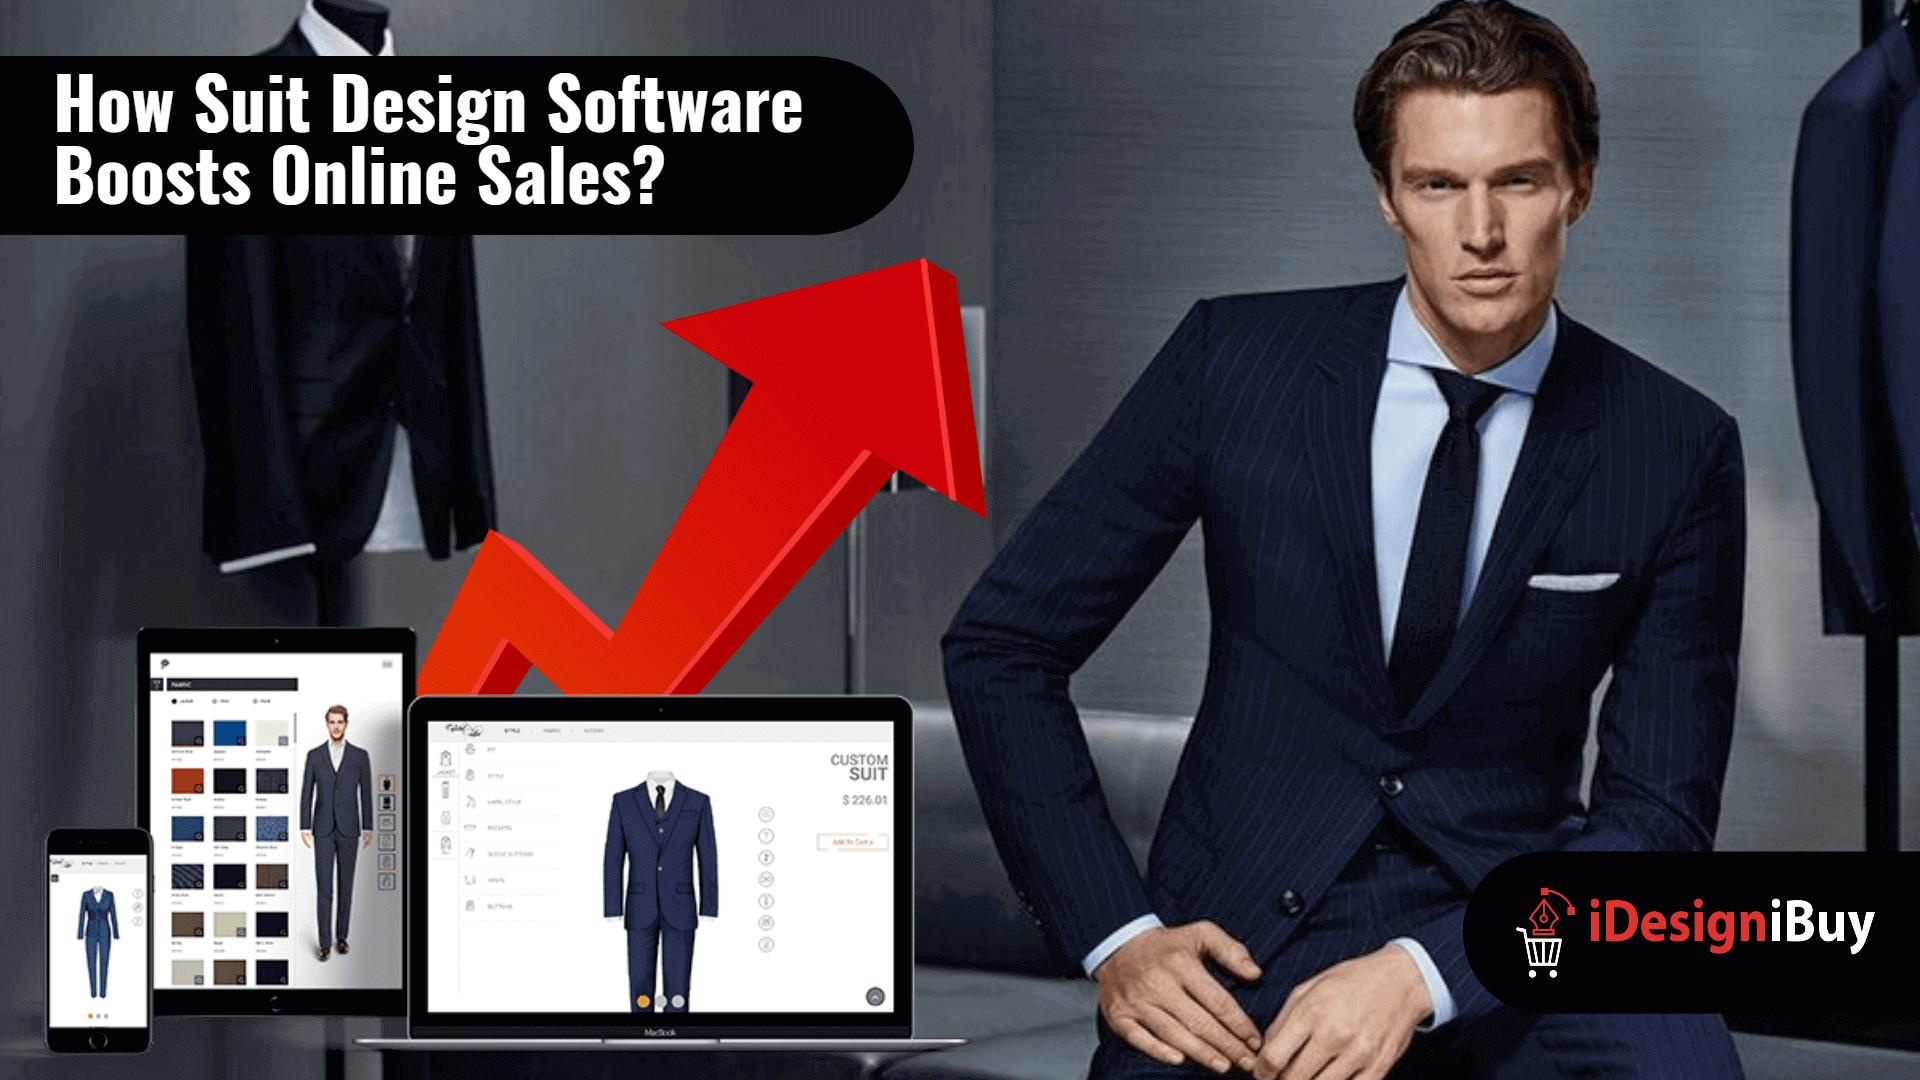 How-Suit-Design-Software-Boosts-Online-Sales?